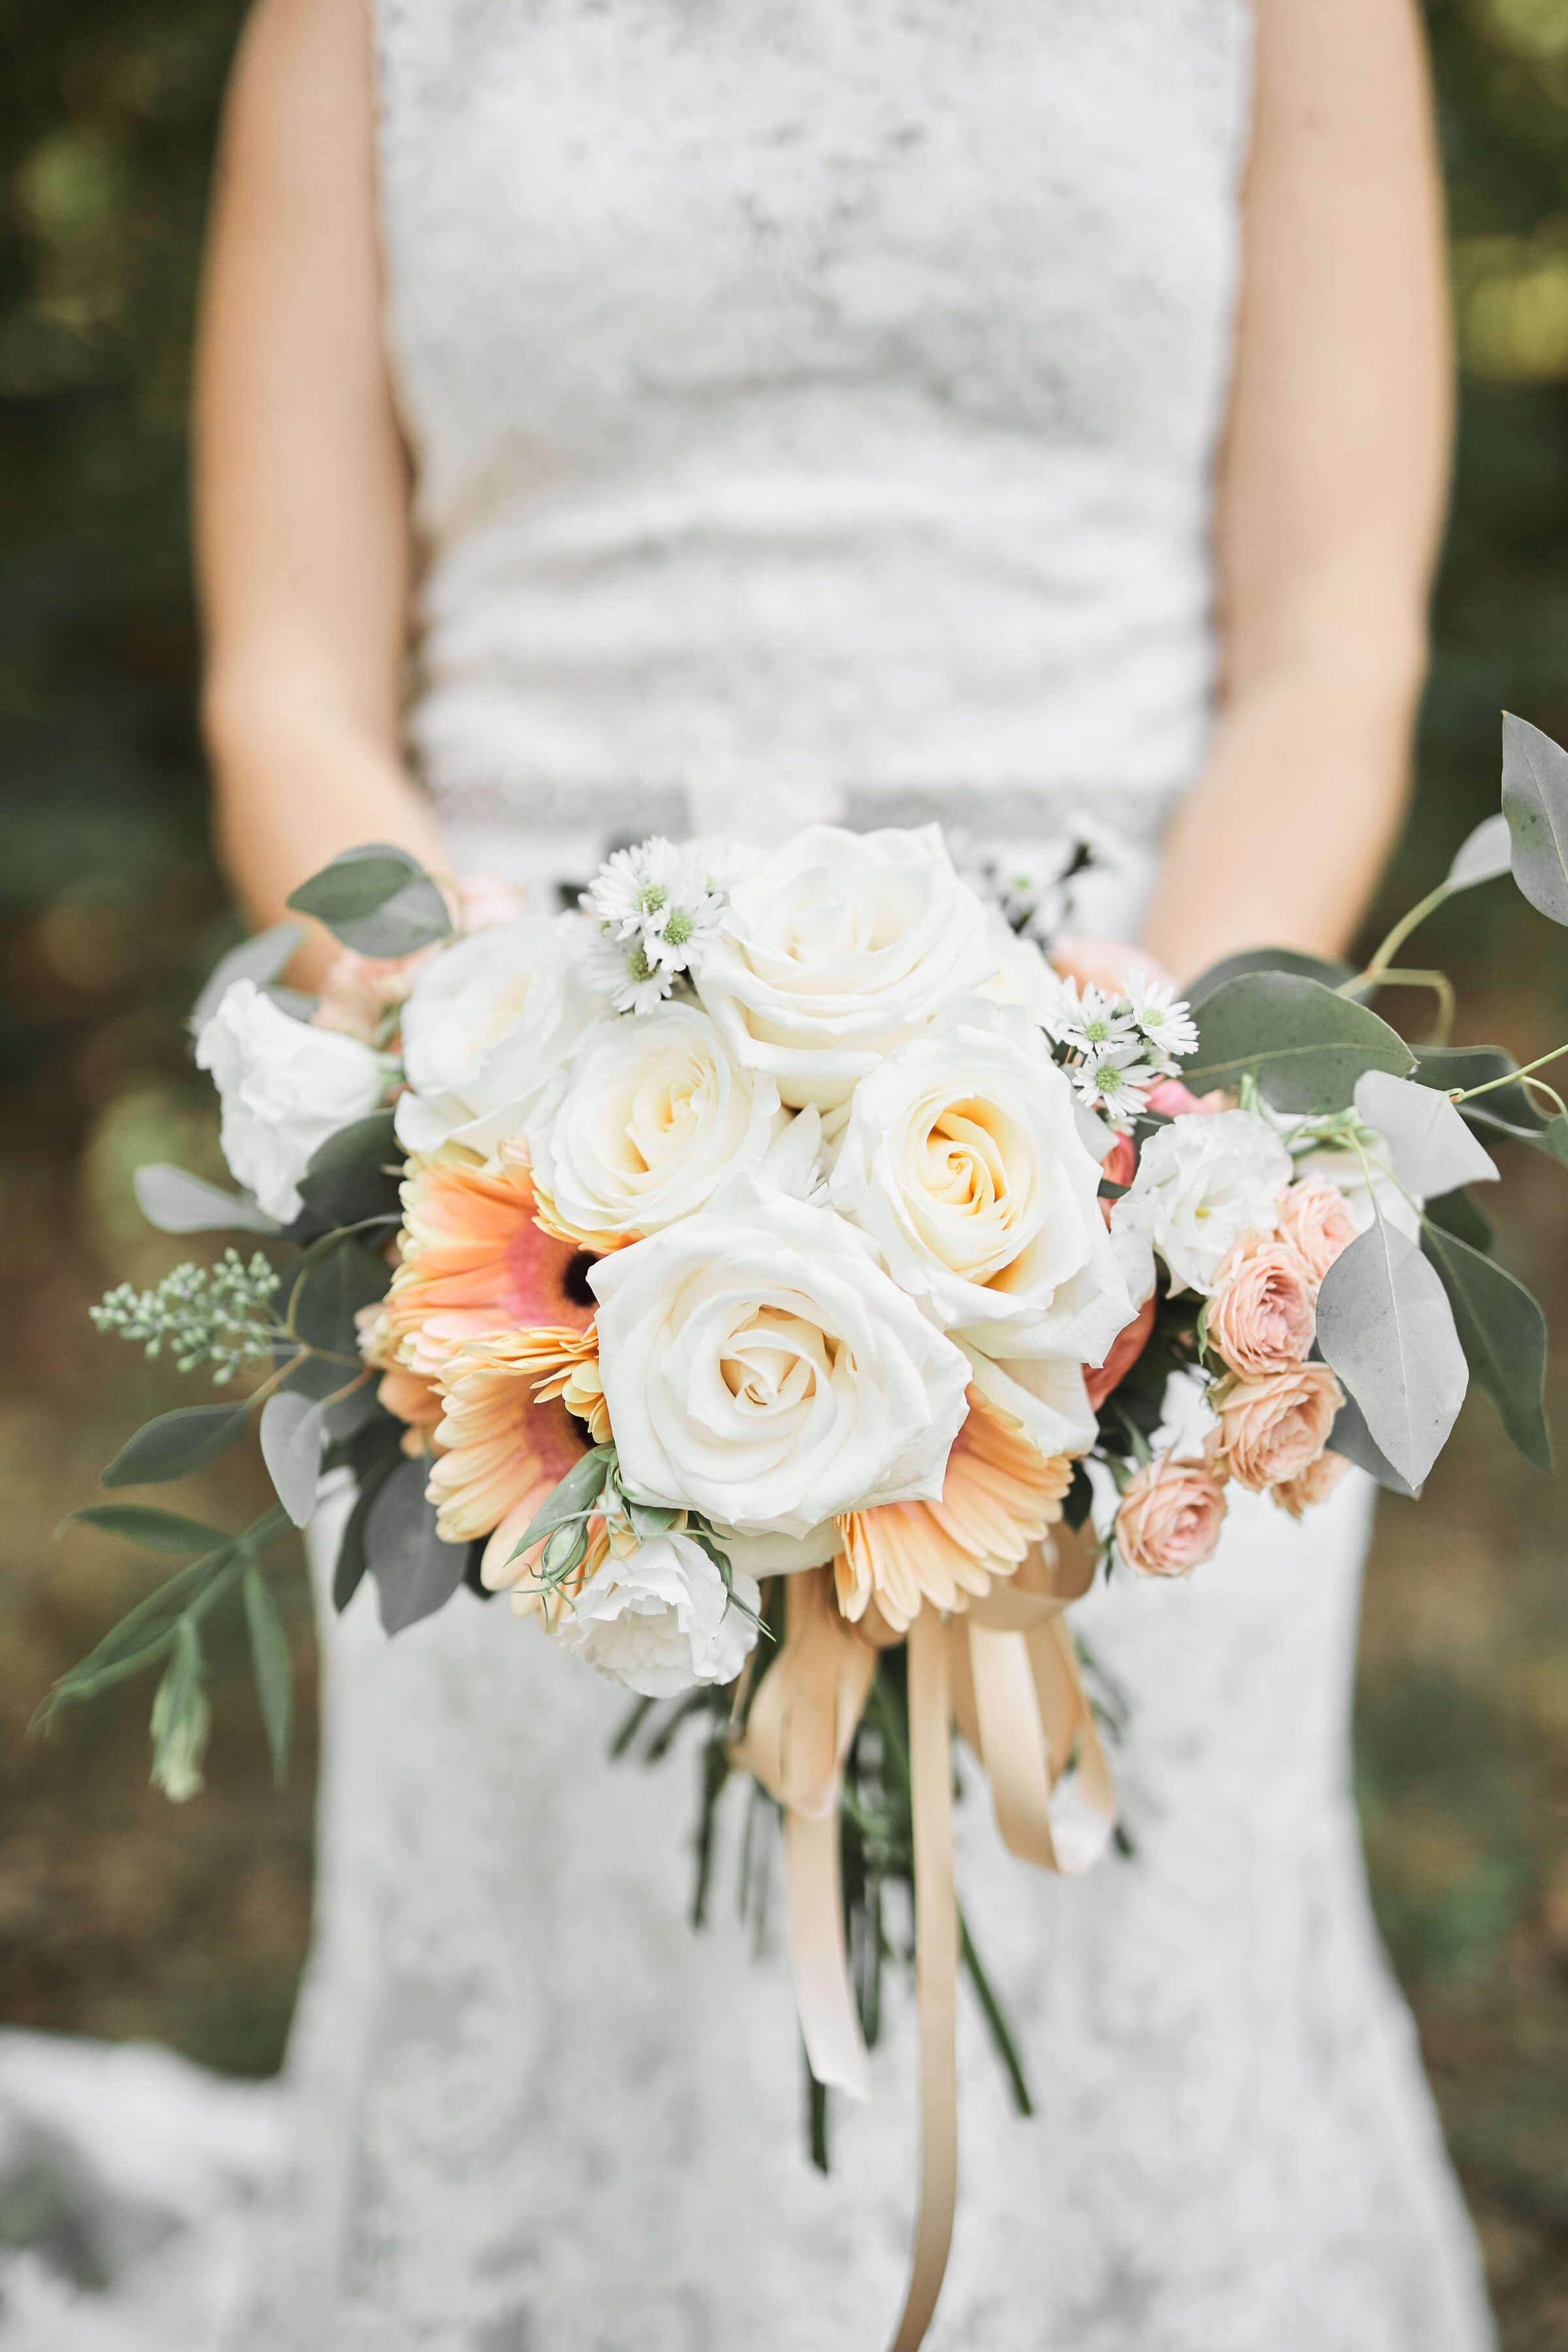 engle-olson-wedding-perry-james-photography-23.jpg